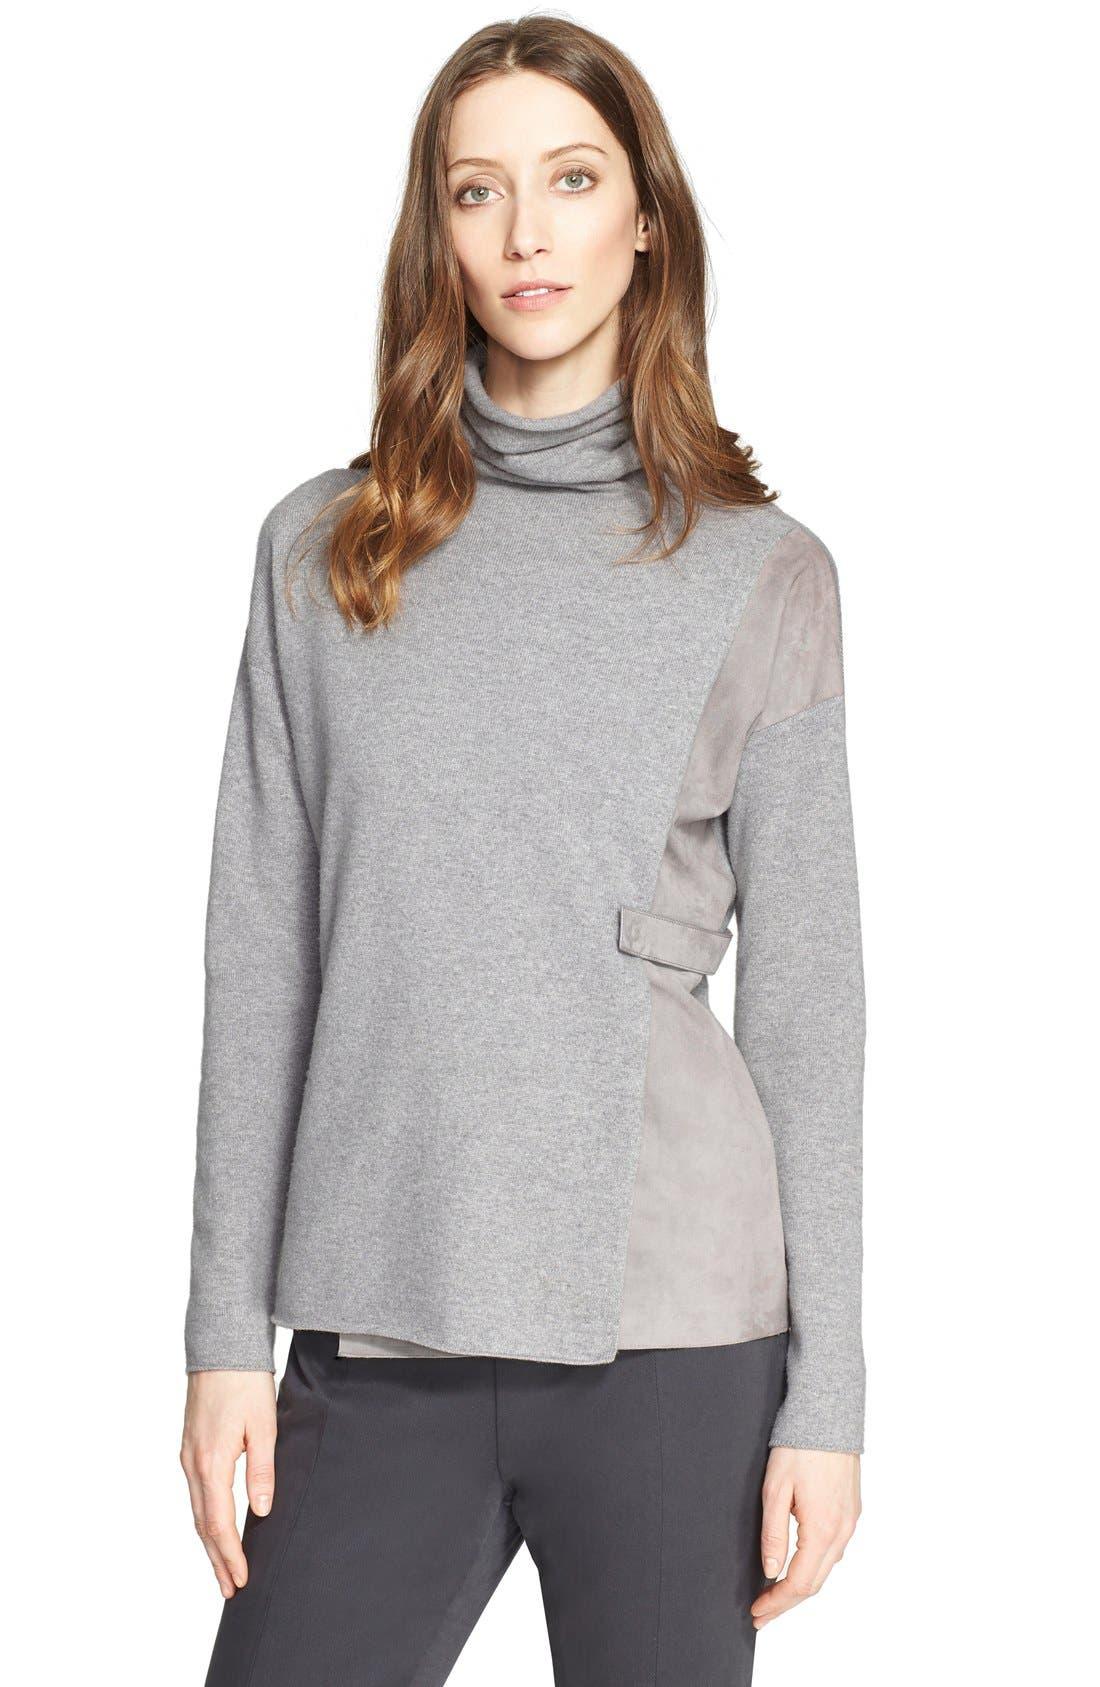 Main Image - Fabiana Filippi Suede Contrast Wool Blend Turtleneck Sweater